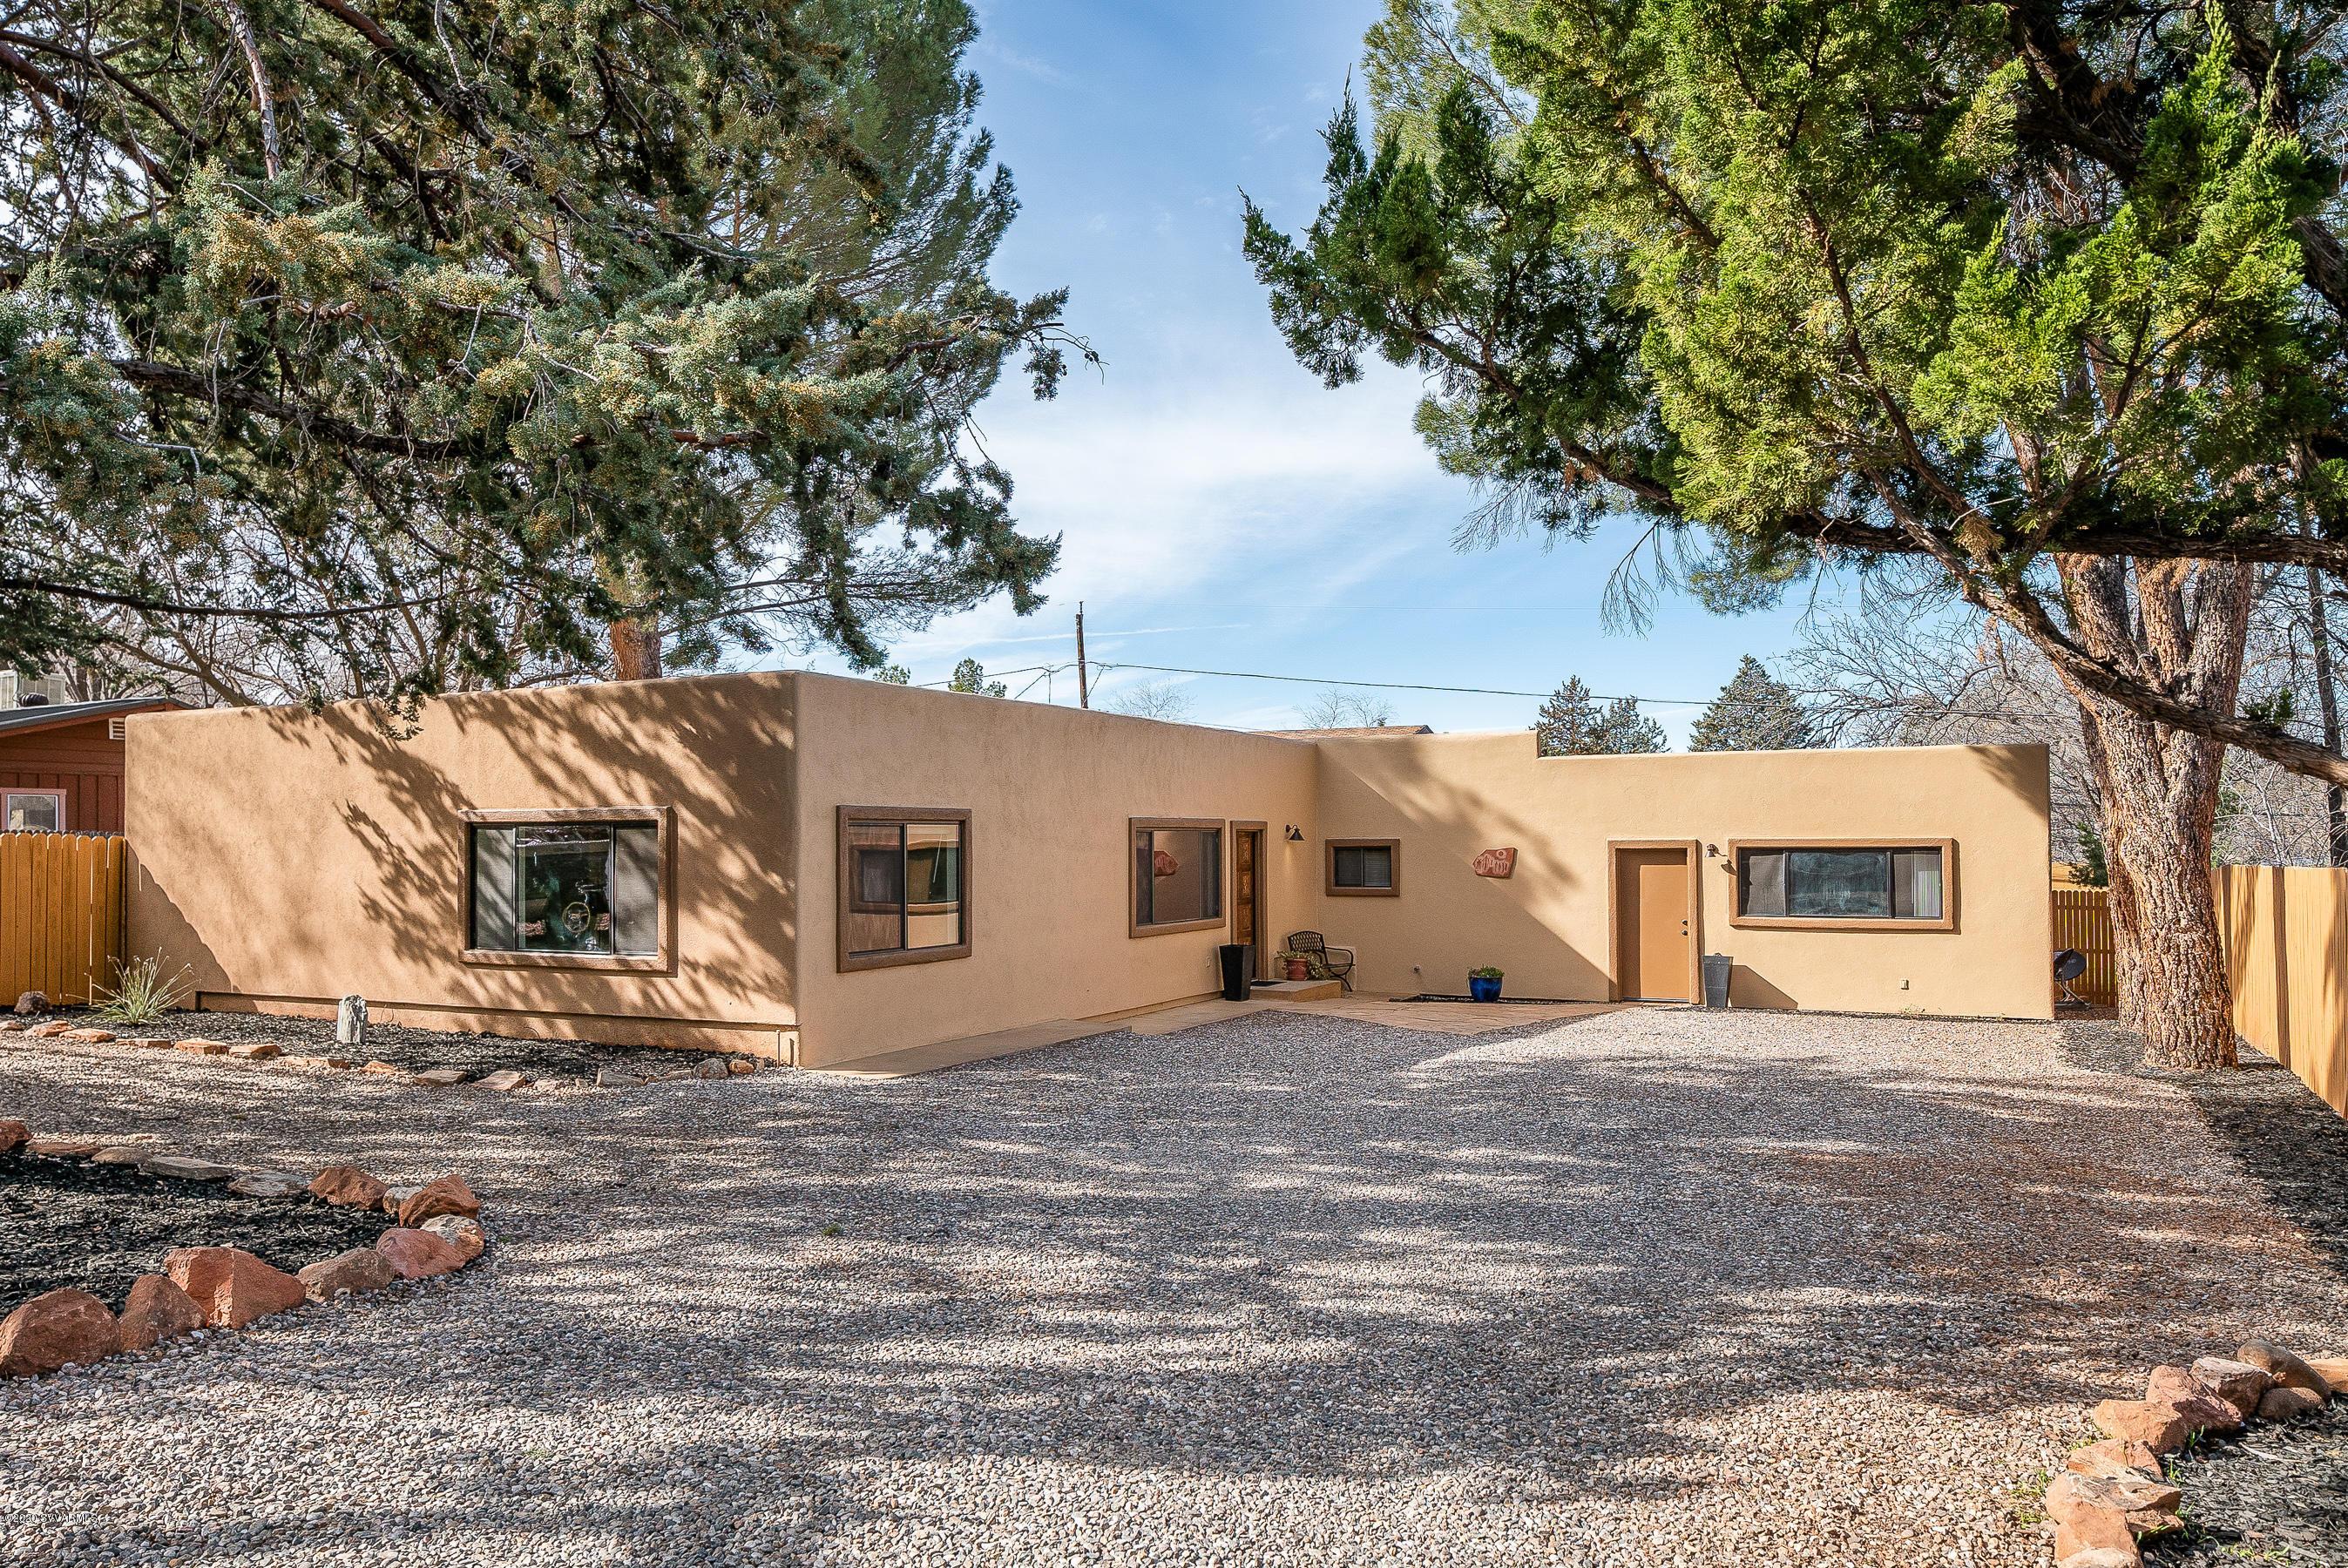 165 Birch Blvd Sedona, AZ 86336